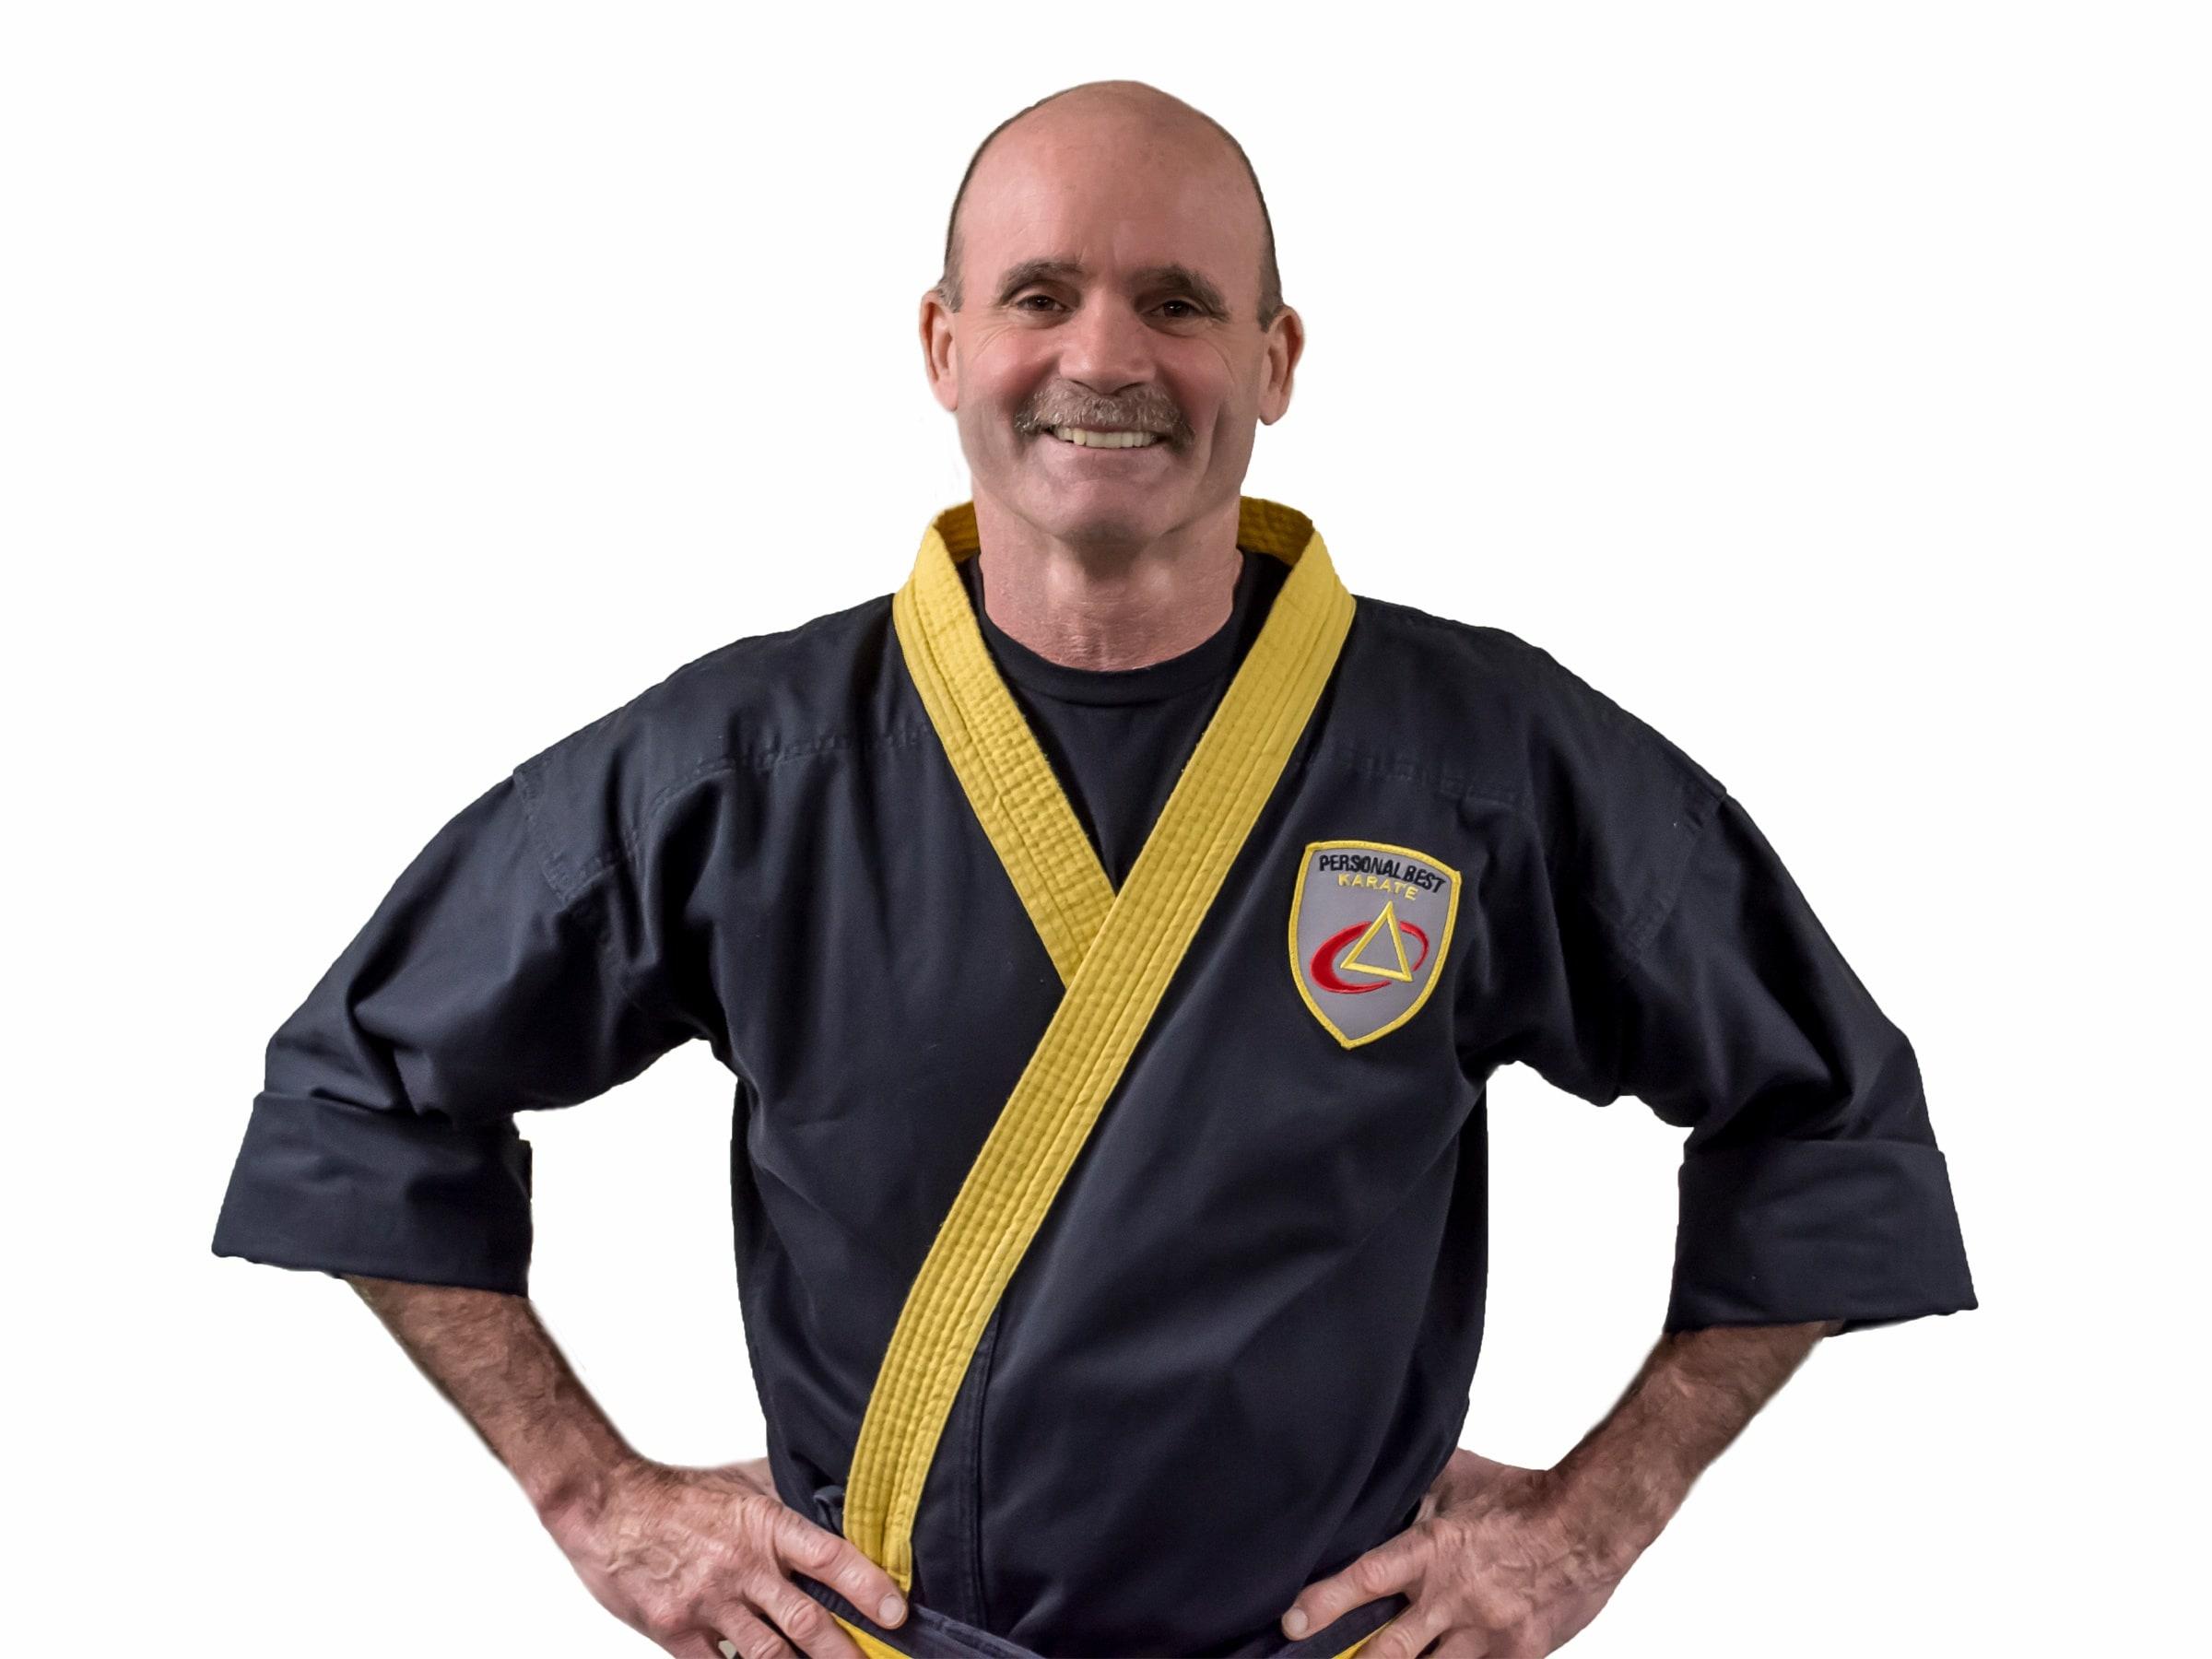 Dana Rappold in Norton - Personal Best Karate